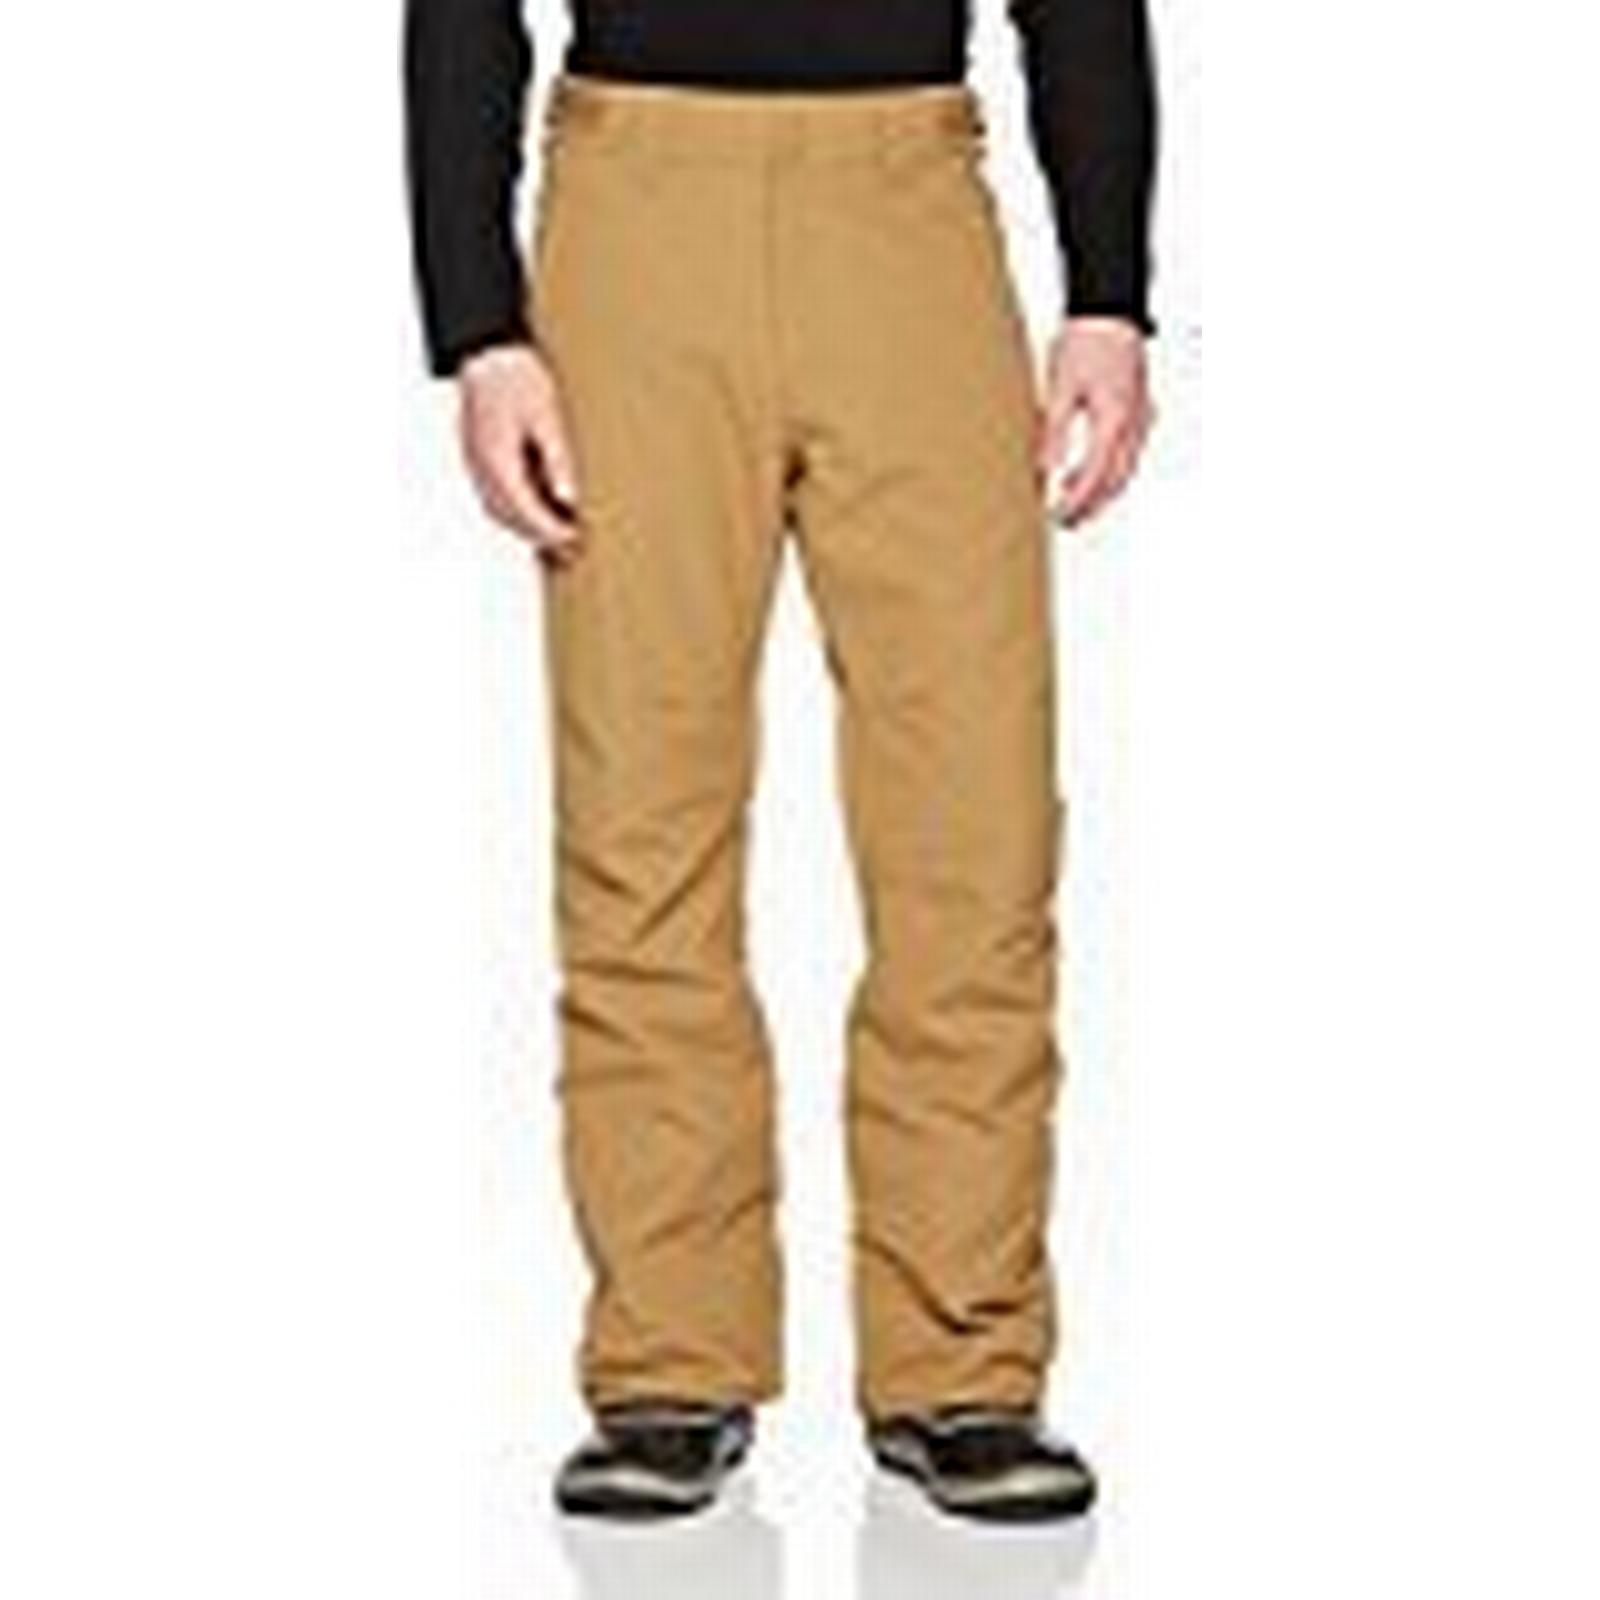 Billabong Lowdown, Lowdown, Men's Snow Trousers, Men's, Lowdown, Lowdown, Bronze, M 5db865